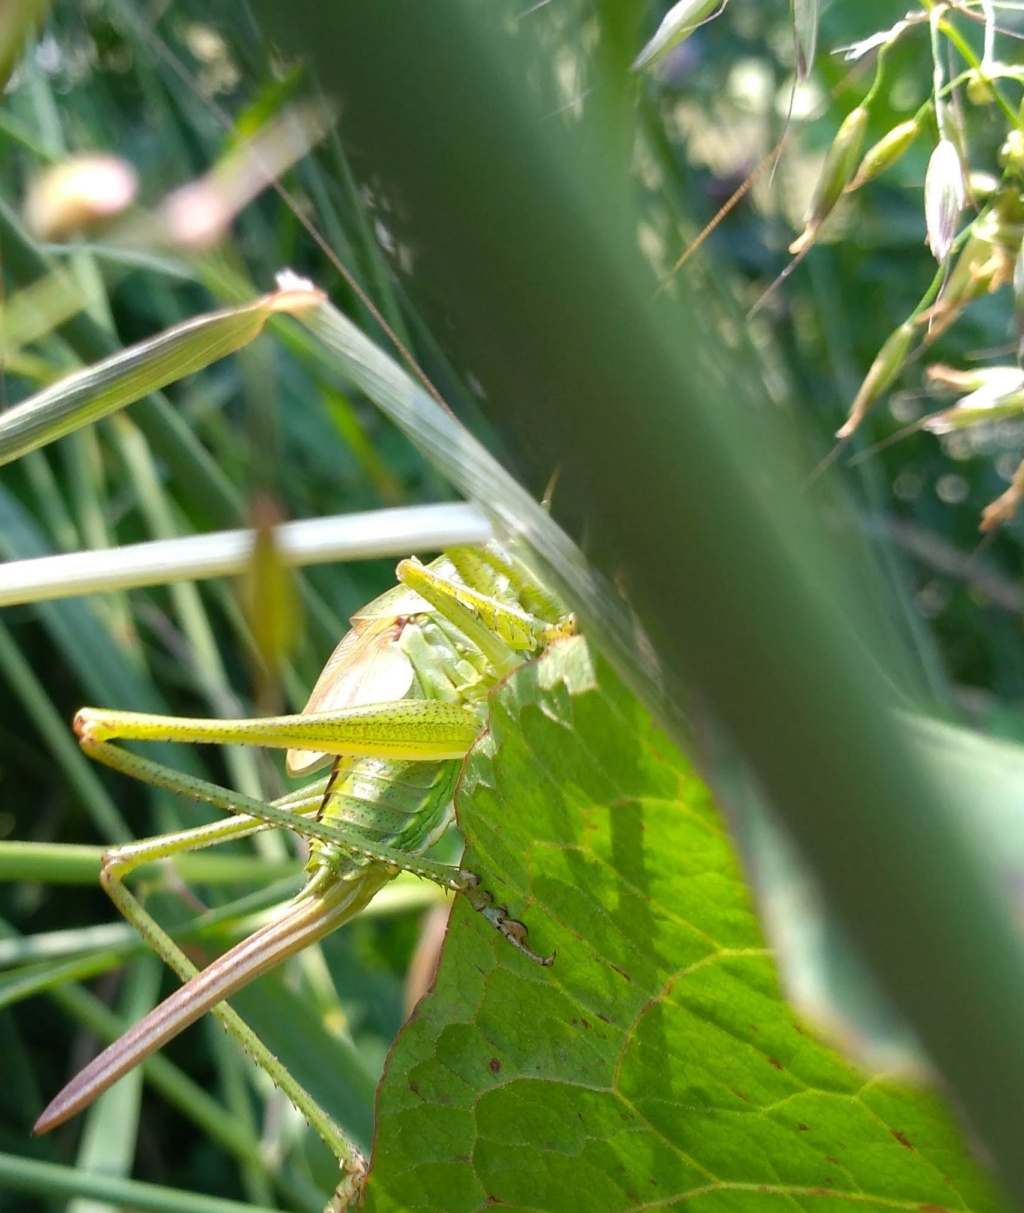 [Tettigonia viridissima] Sauterelle seine et marne Img_2029